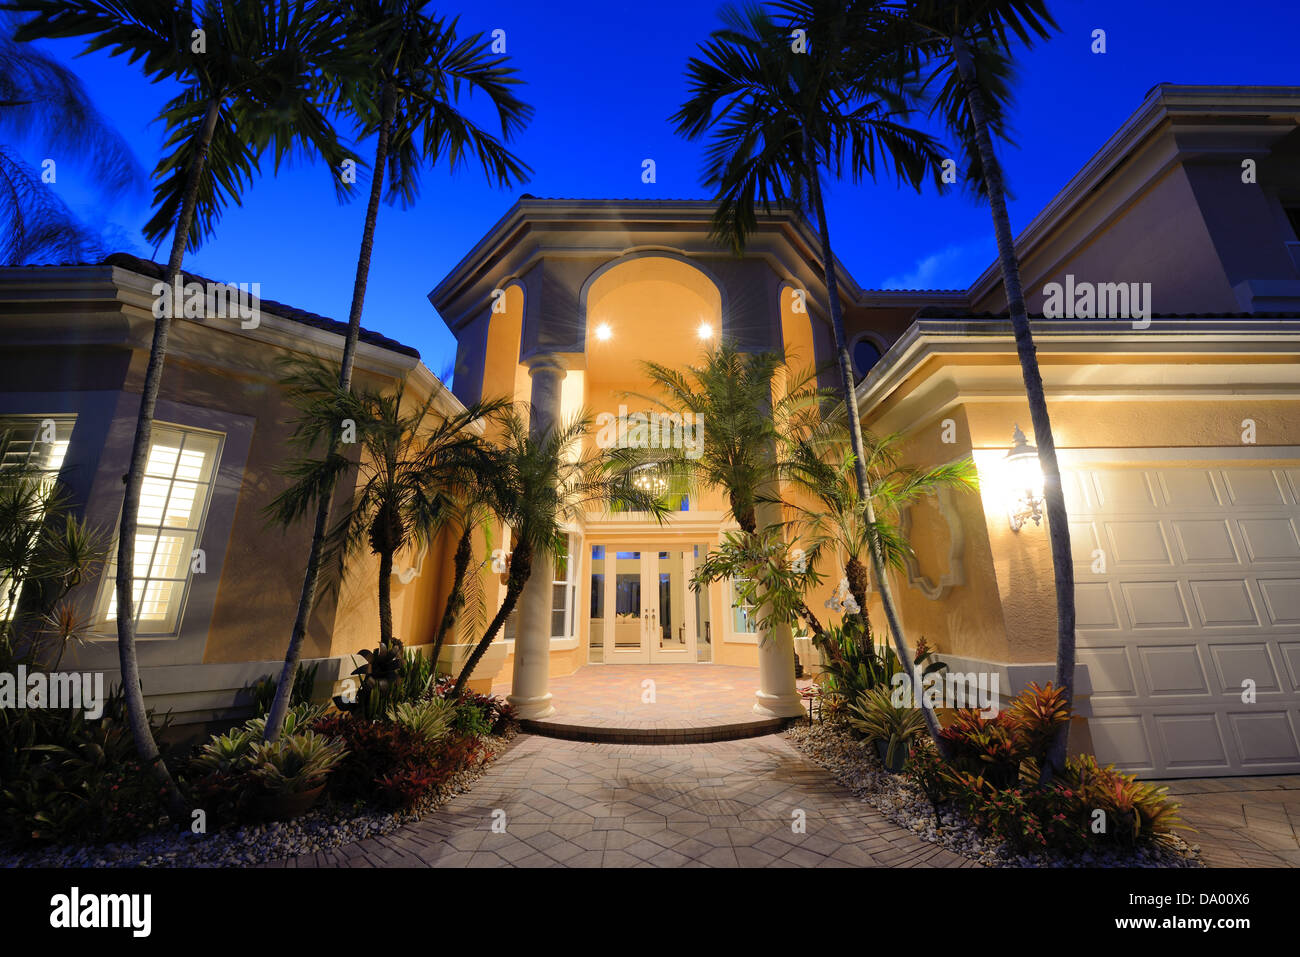 Villa-Eingang an einem tropischen Ort. Stockbild